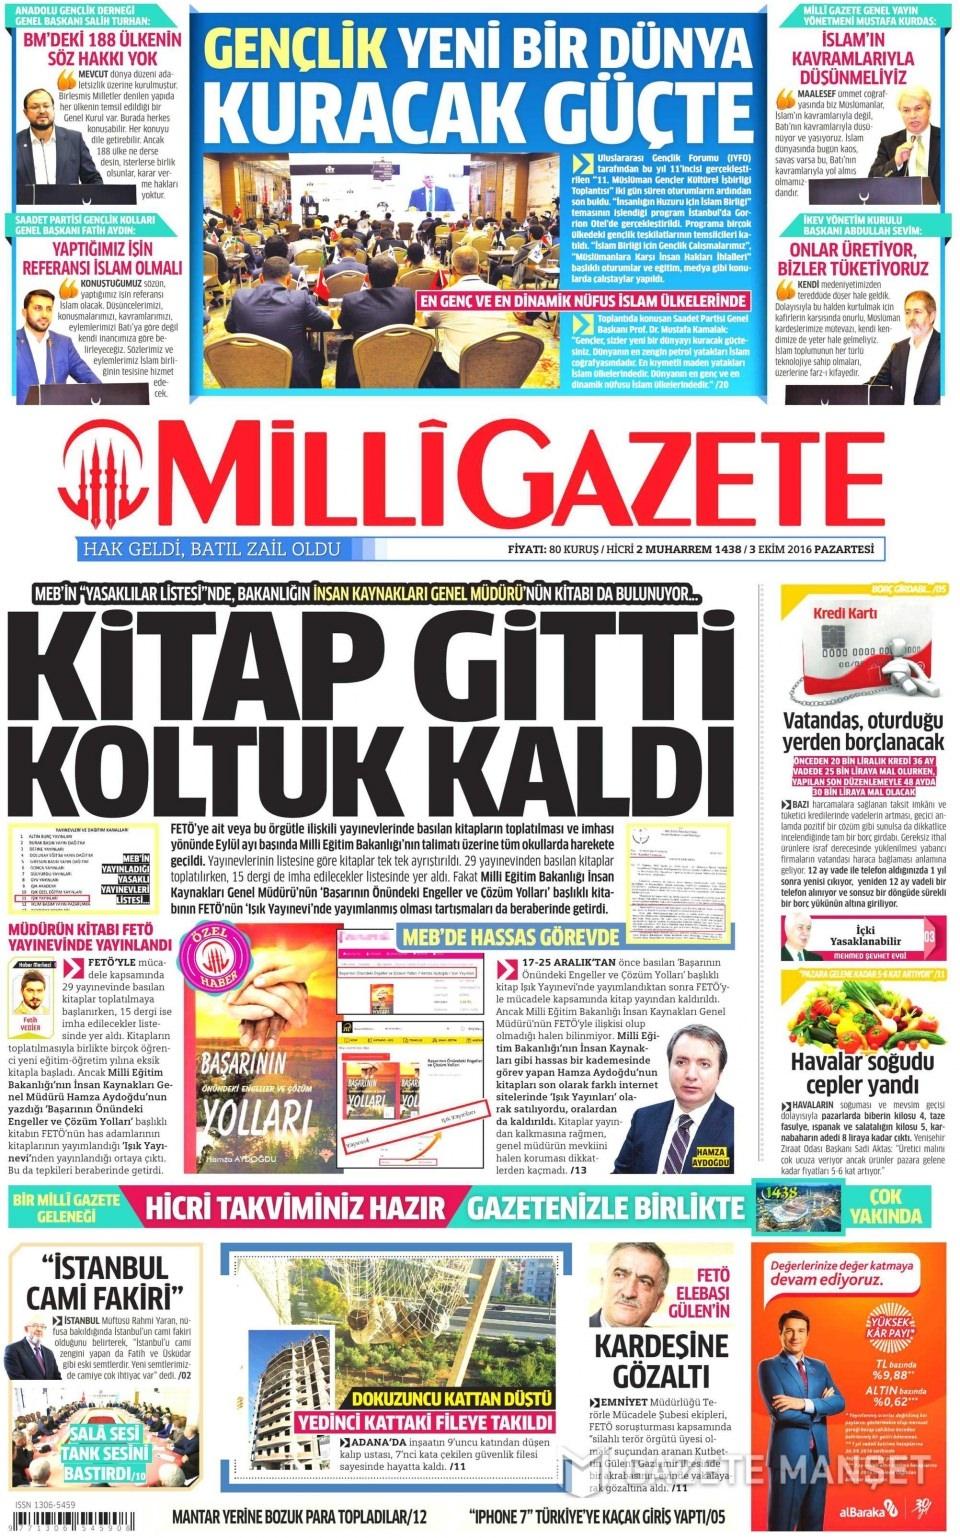 3 Ekim Pazartesi gazete manşetleri 16